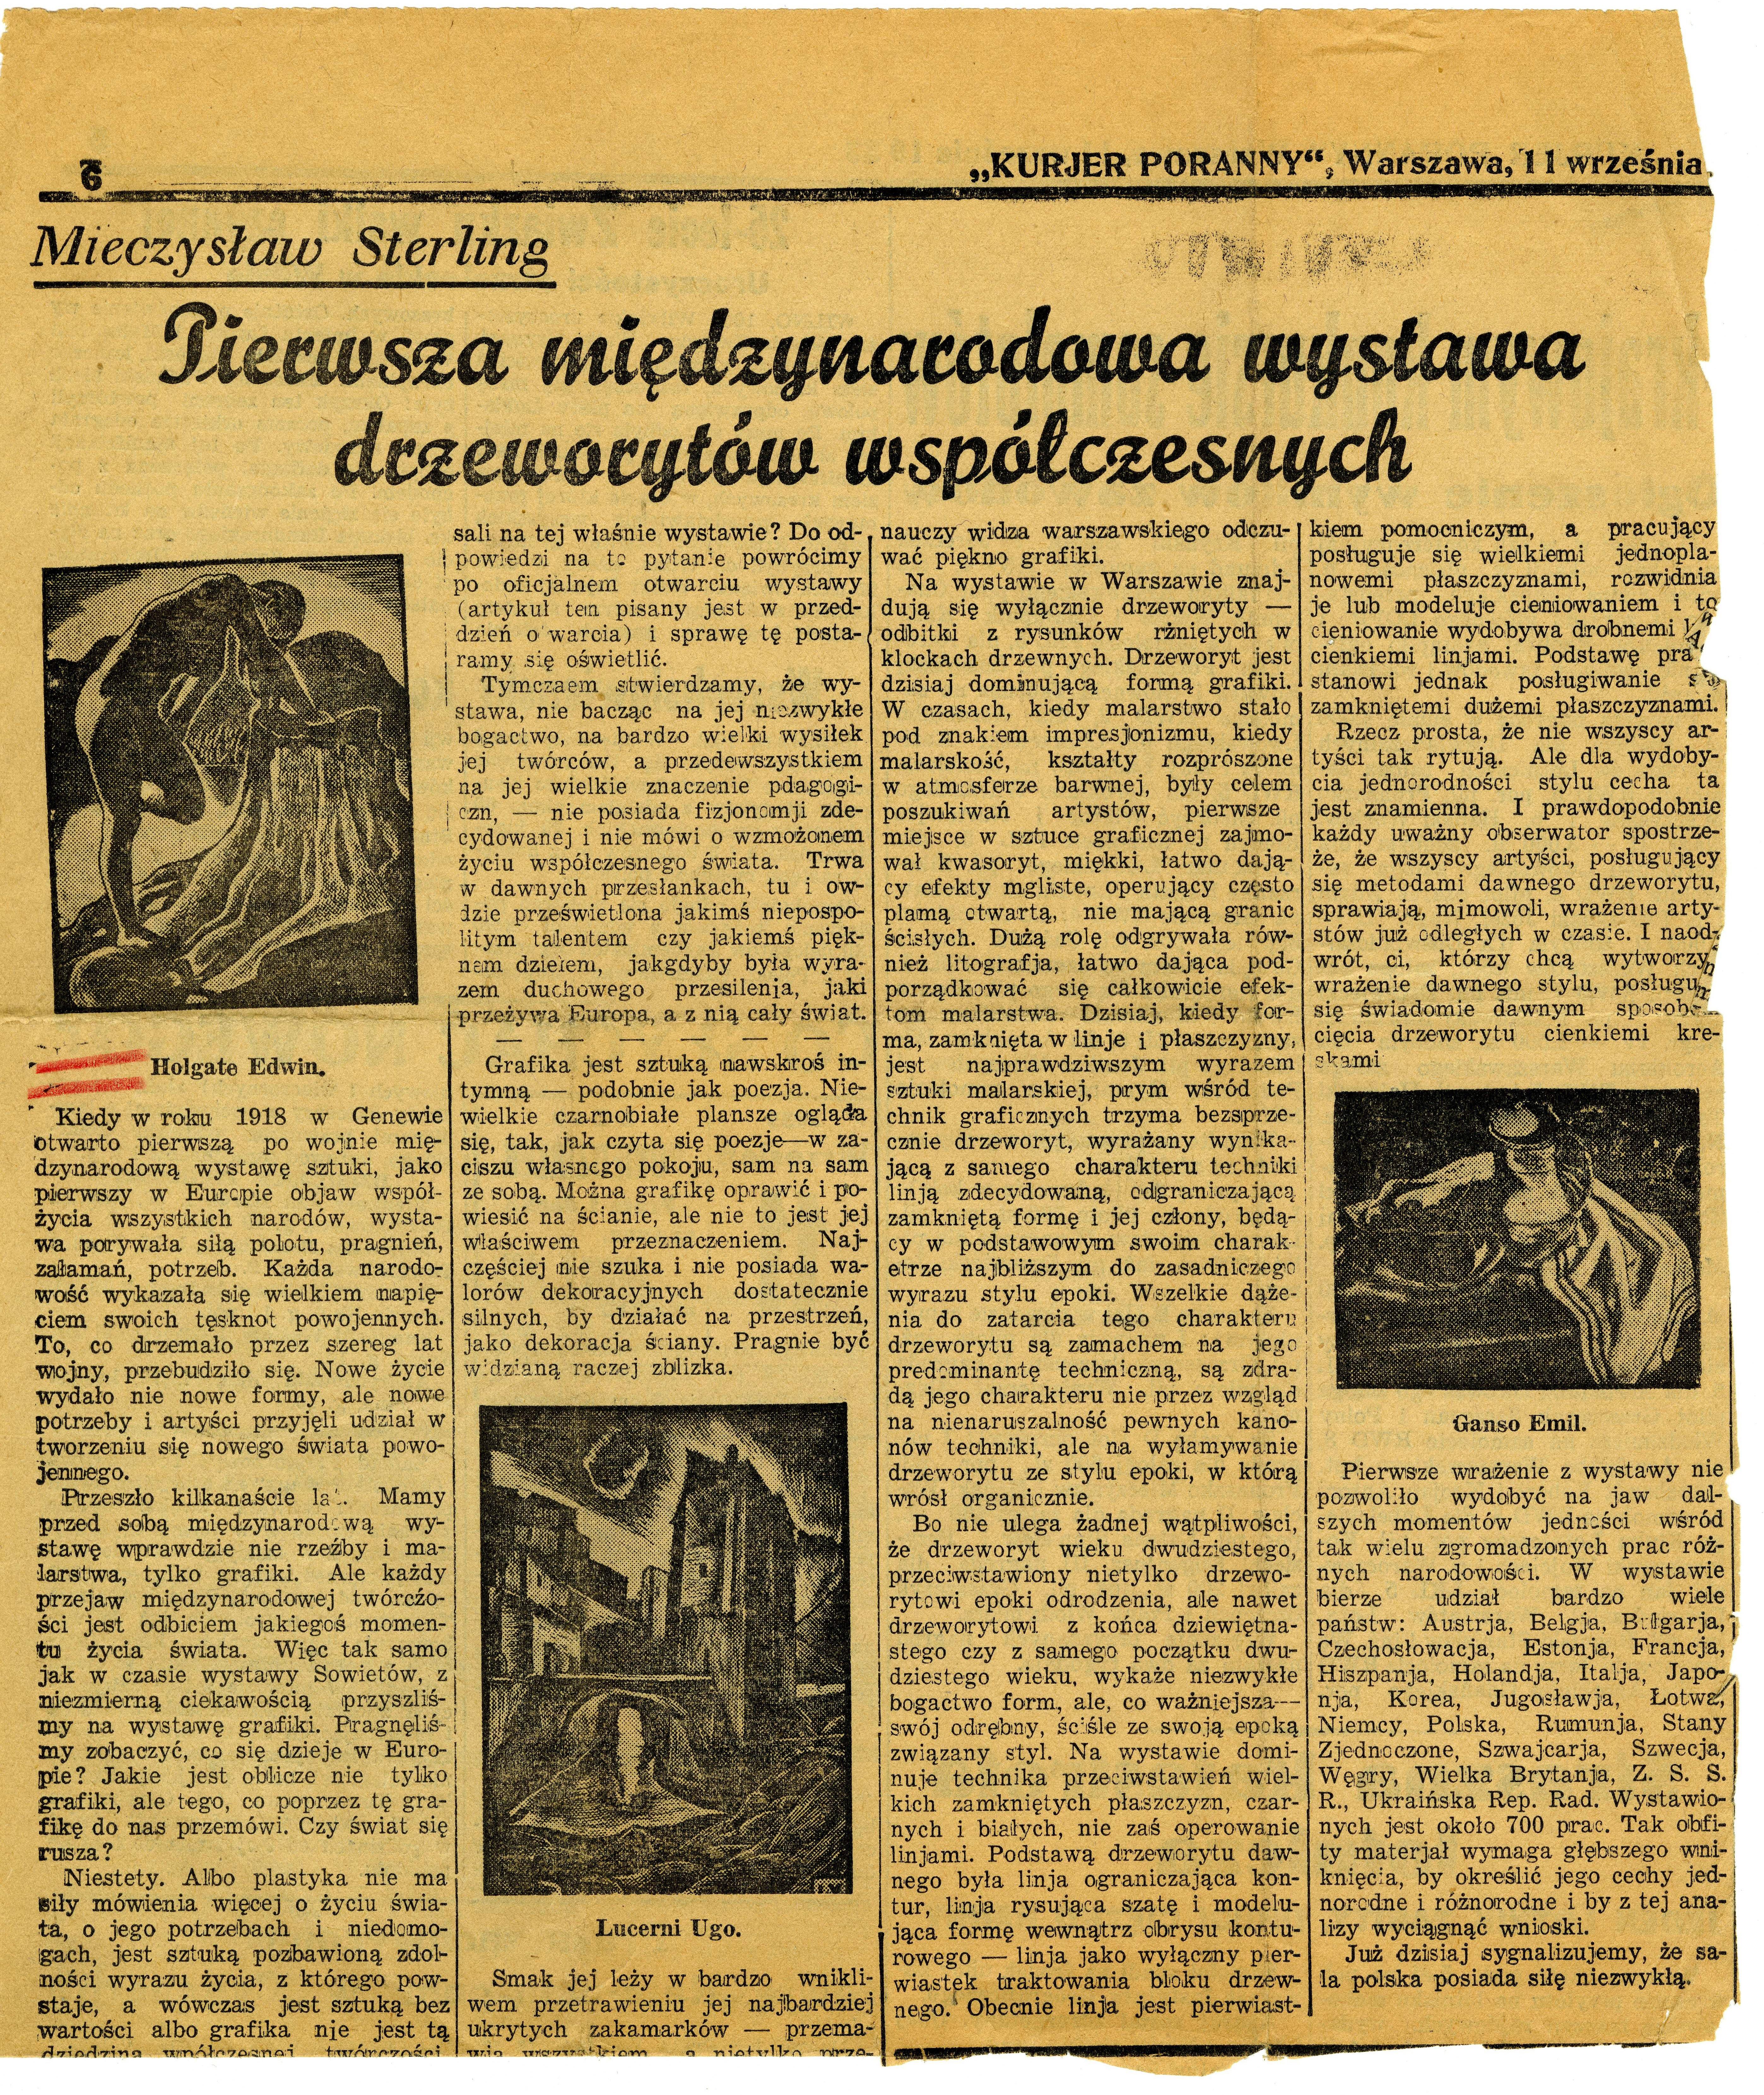 Clipping of Mieczysław Sterling's